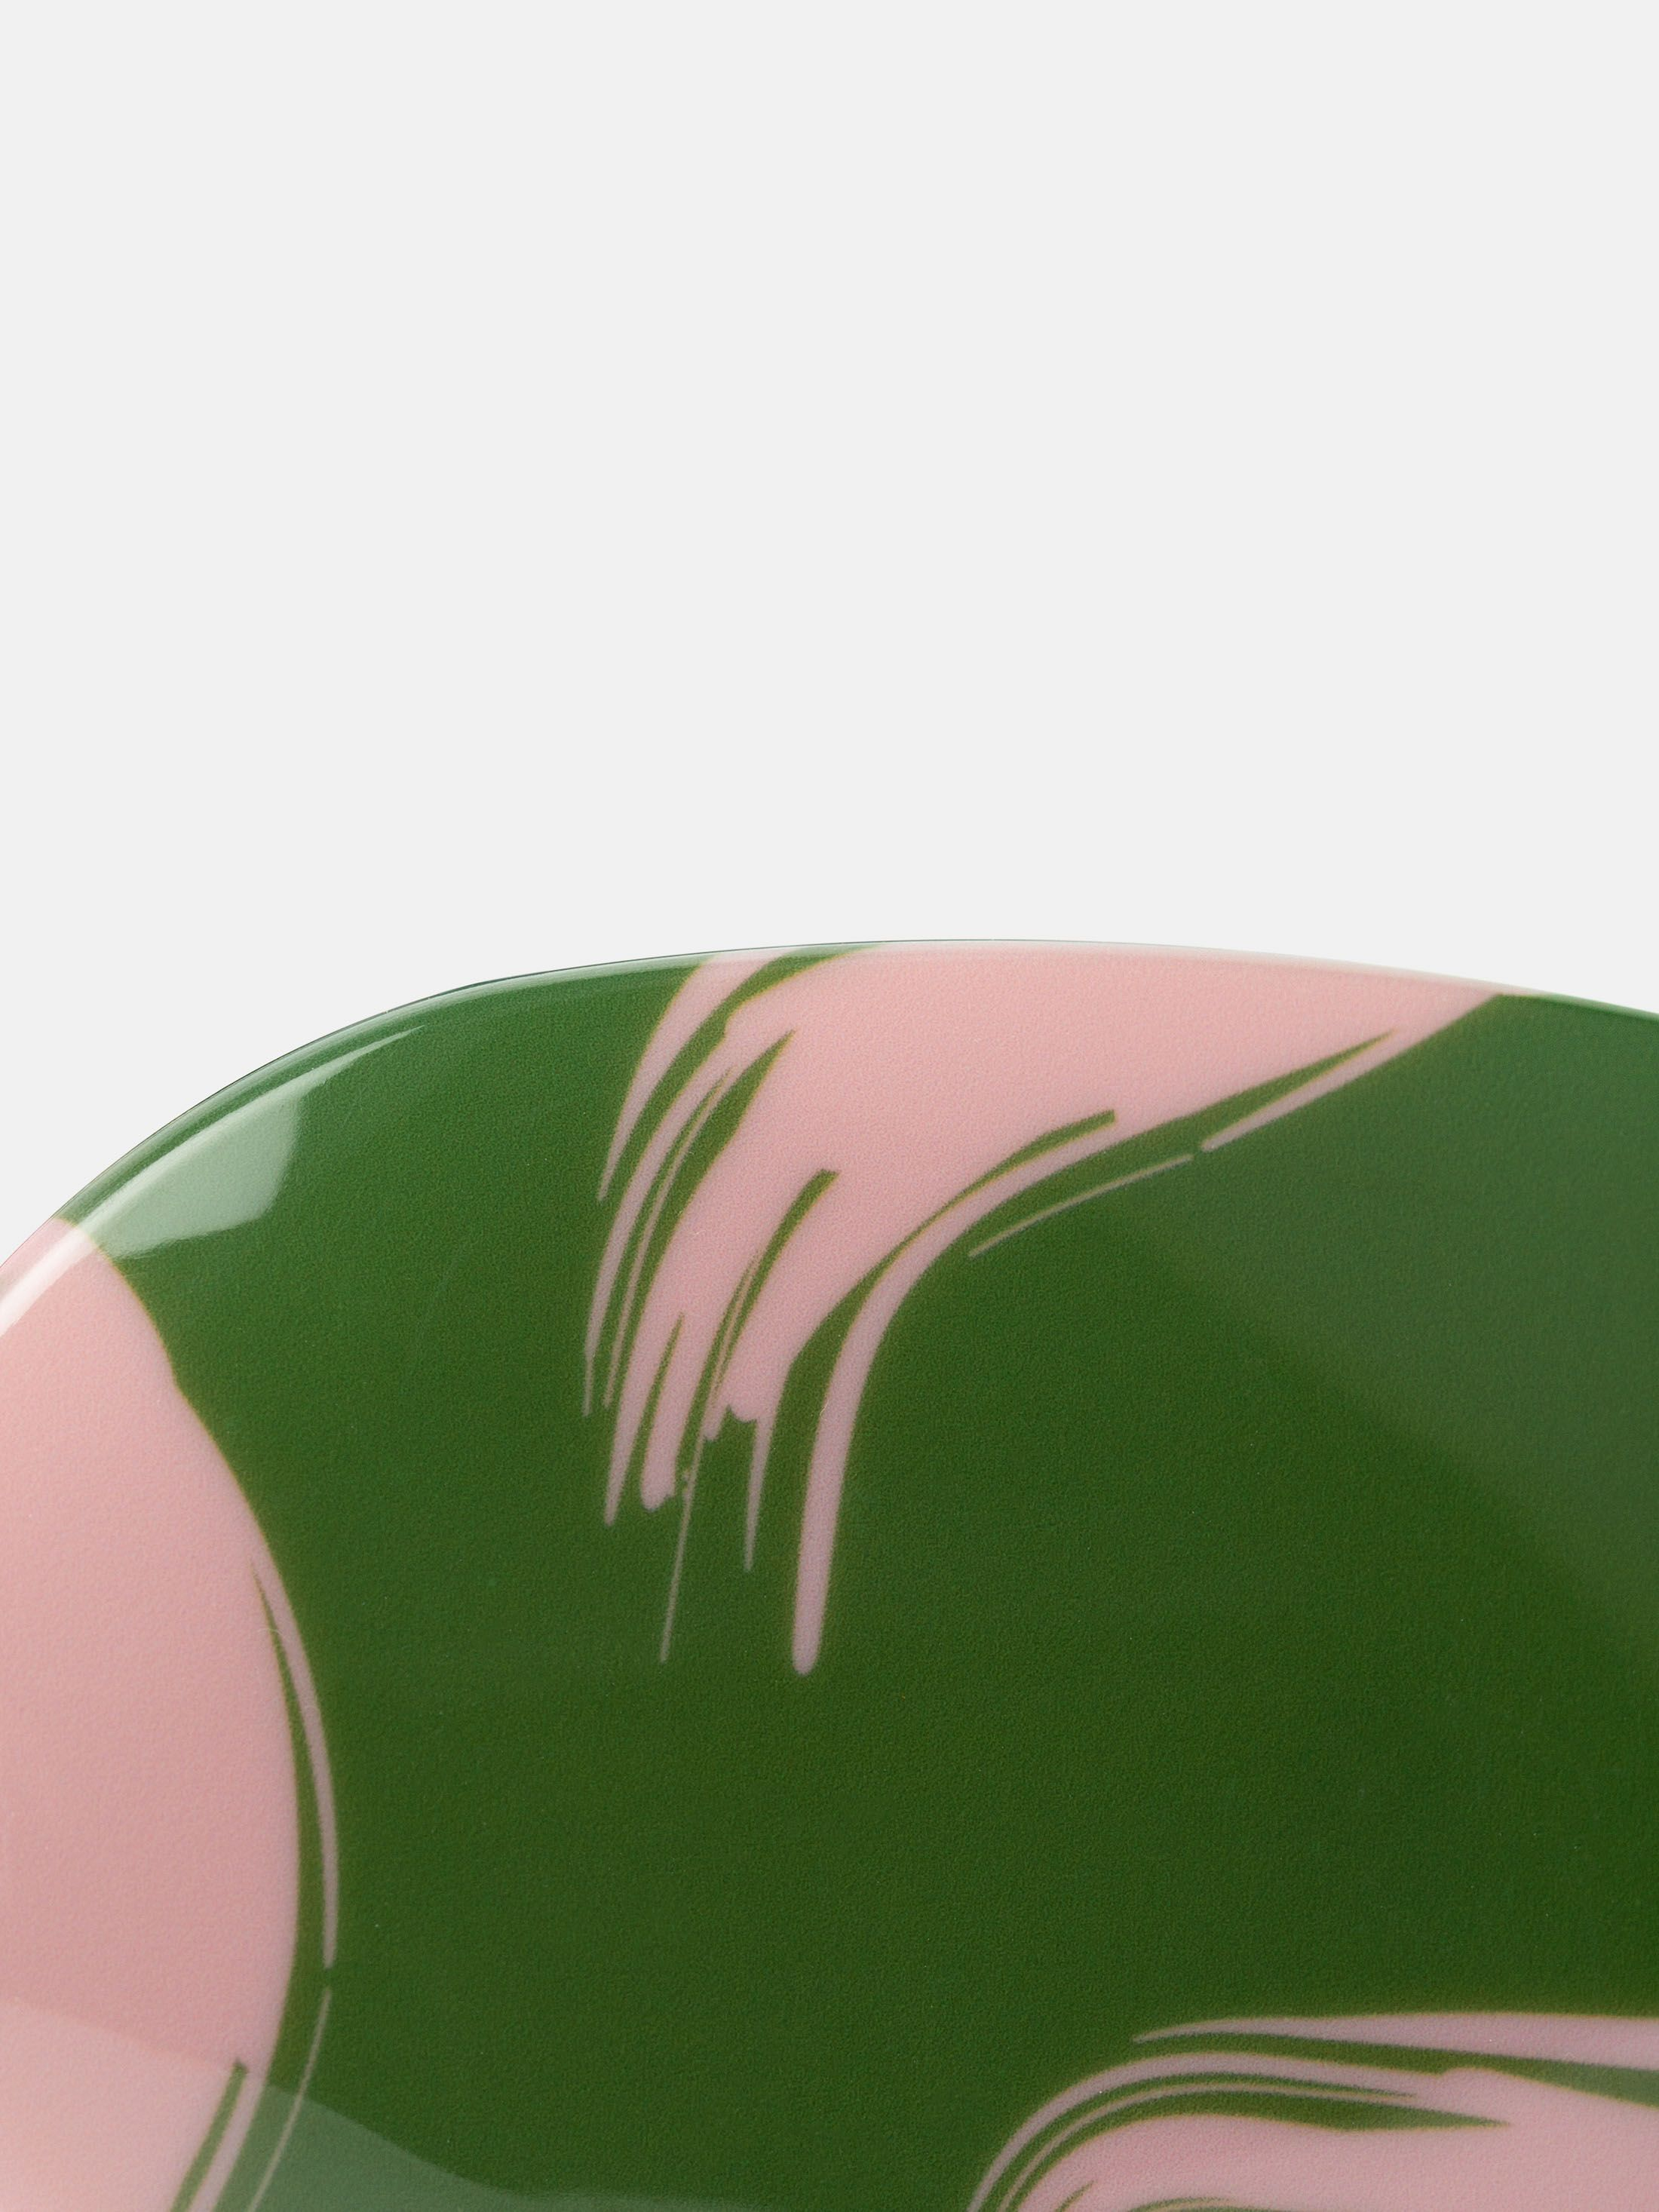 detail griff haarbürste